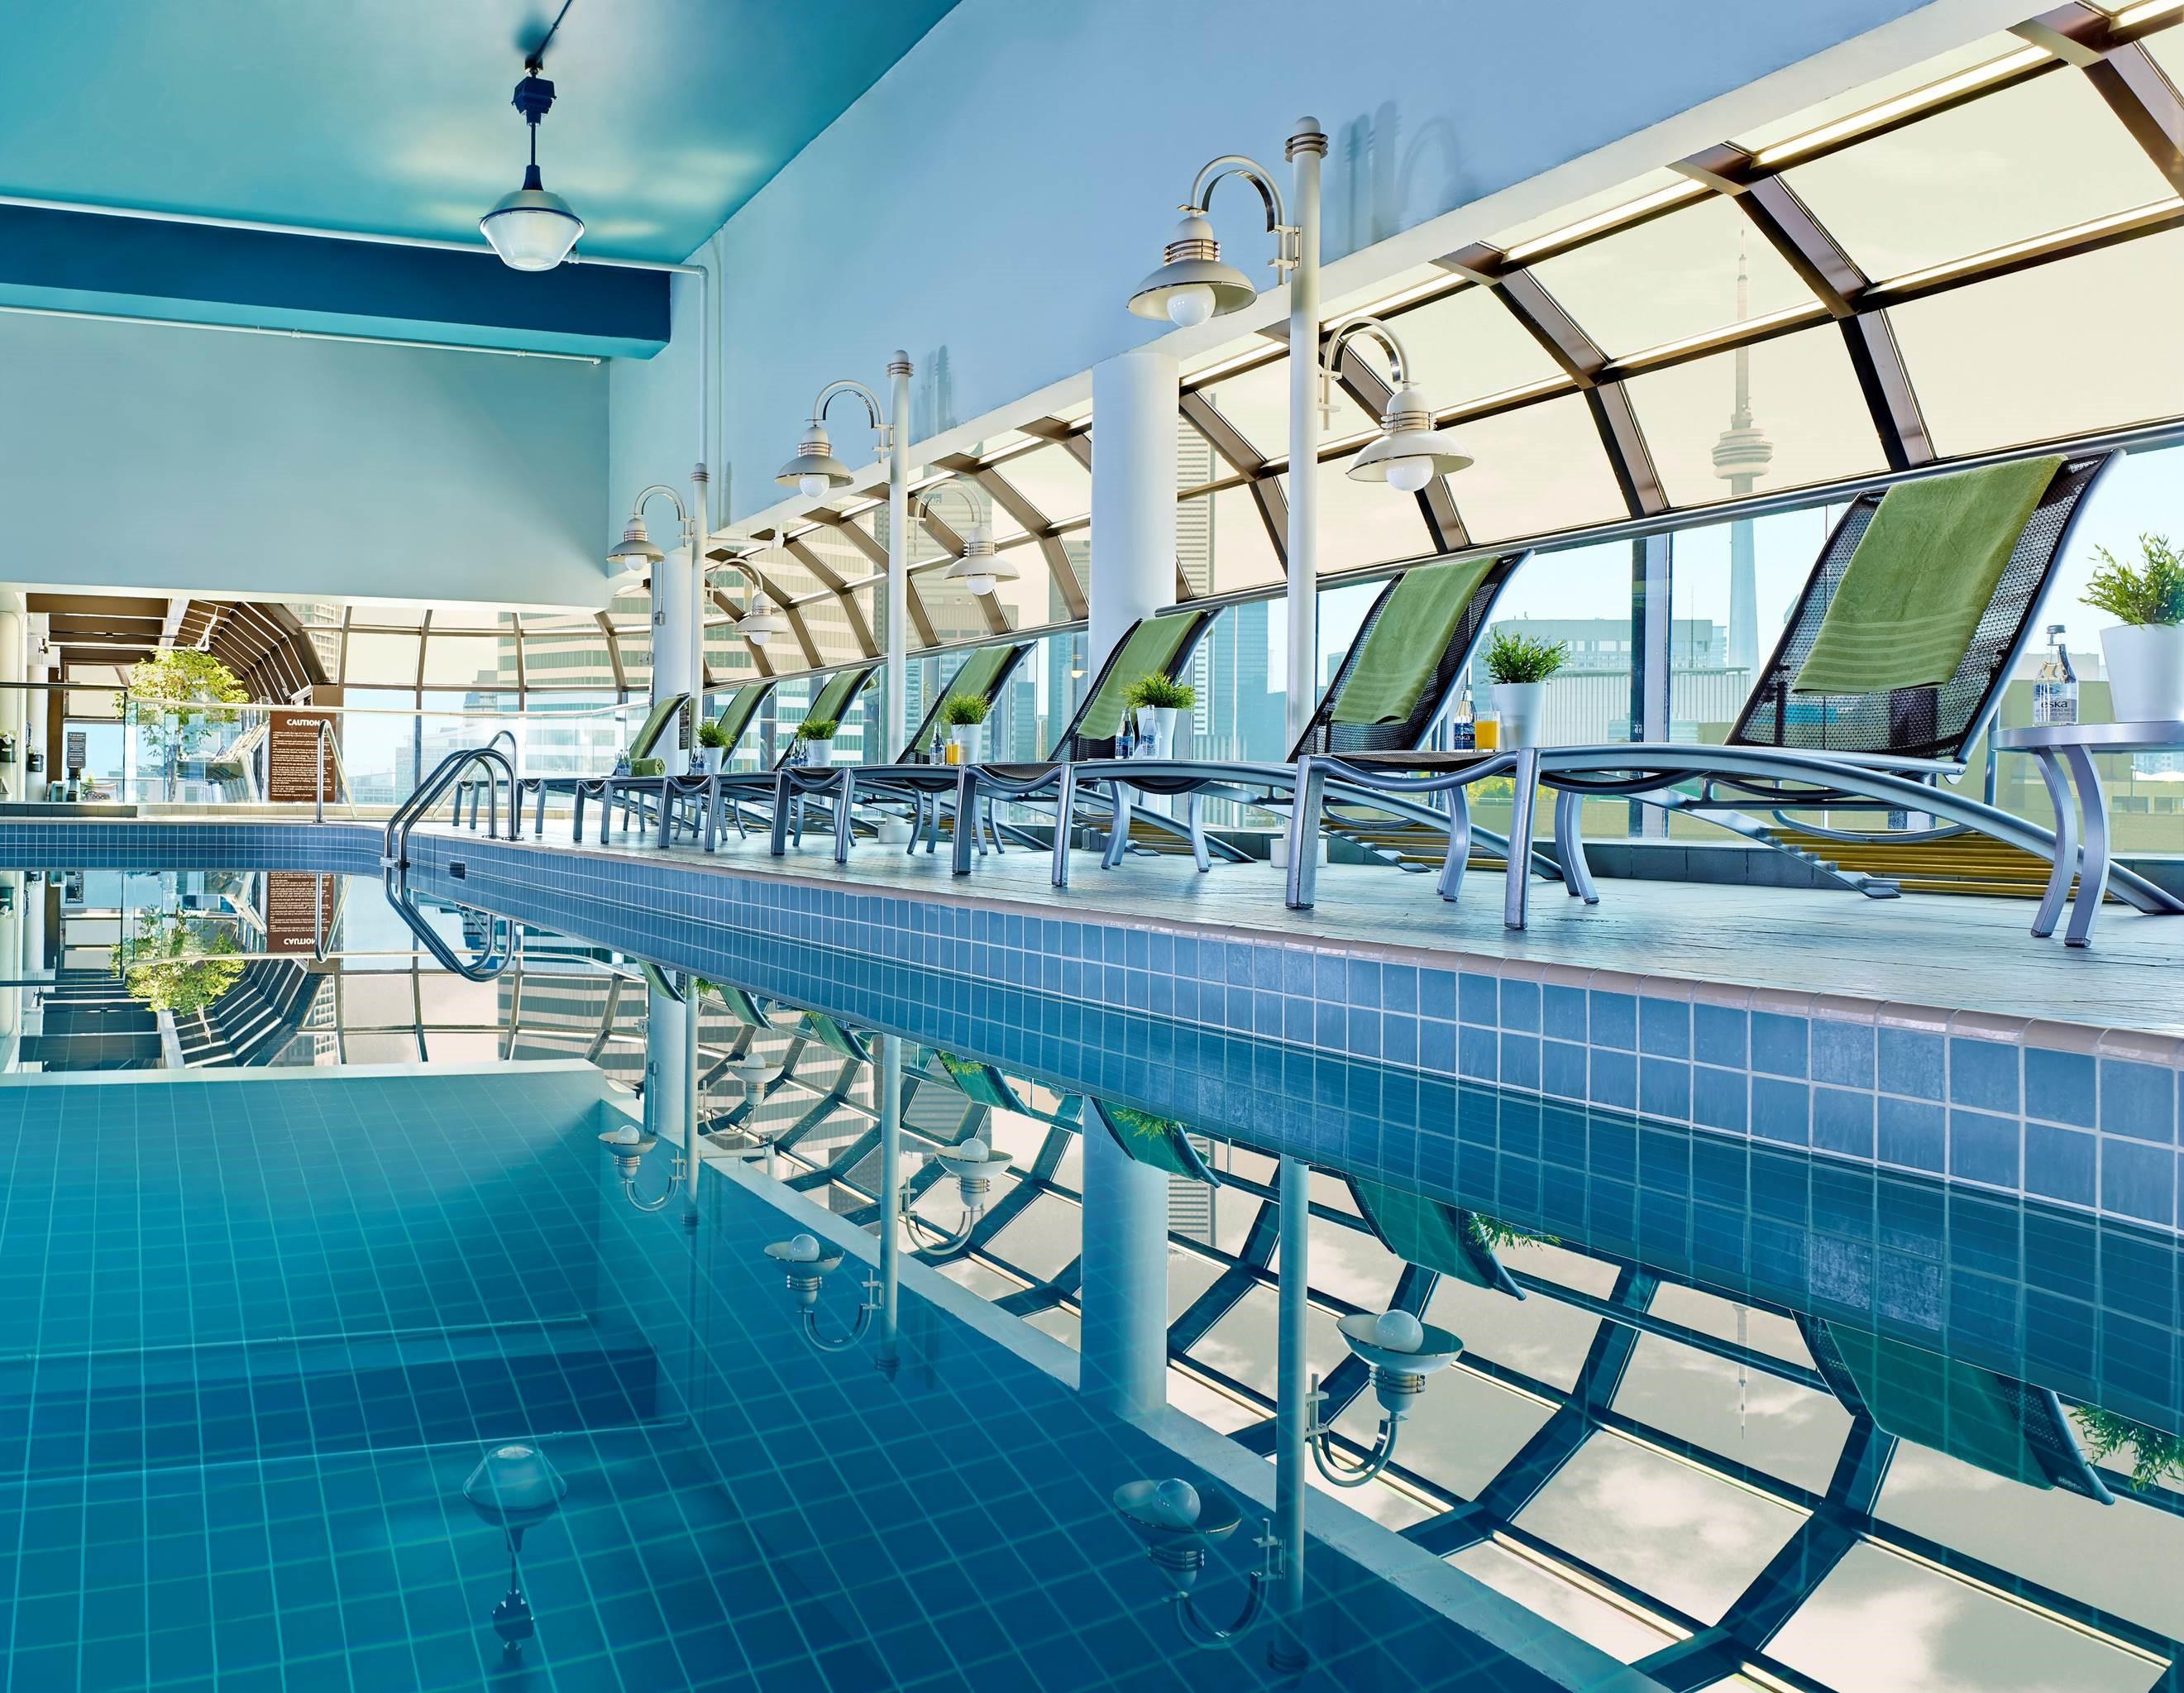 CHELSEA HOTEL, TORONTO in Toronto: Chelsea Hotel Deck 27 Pool